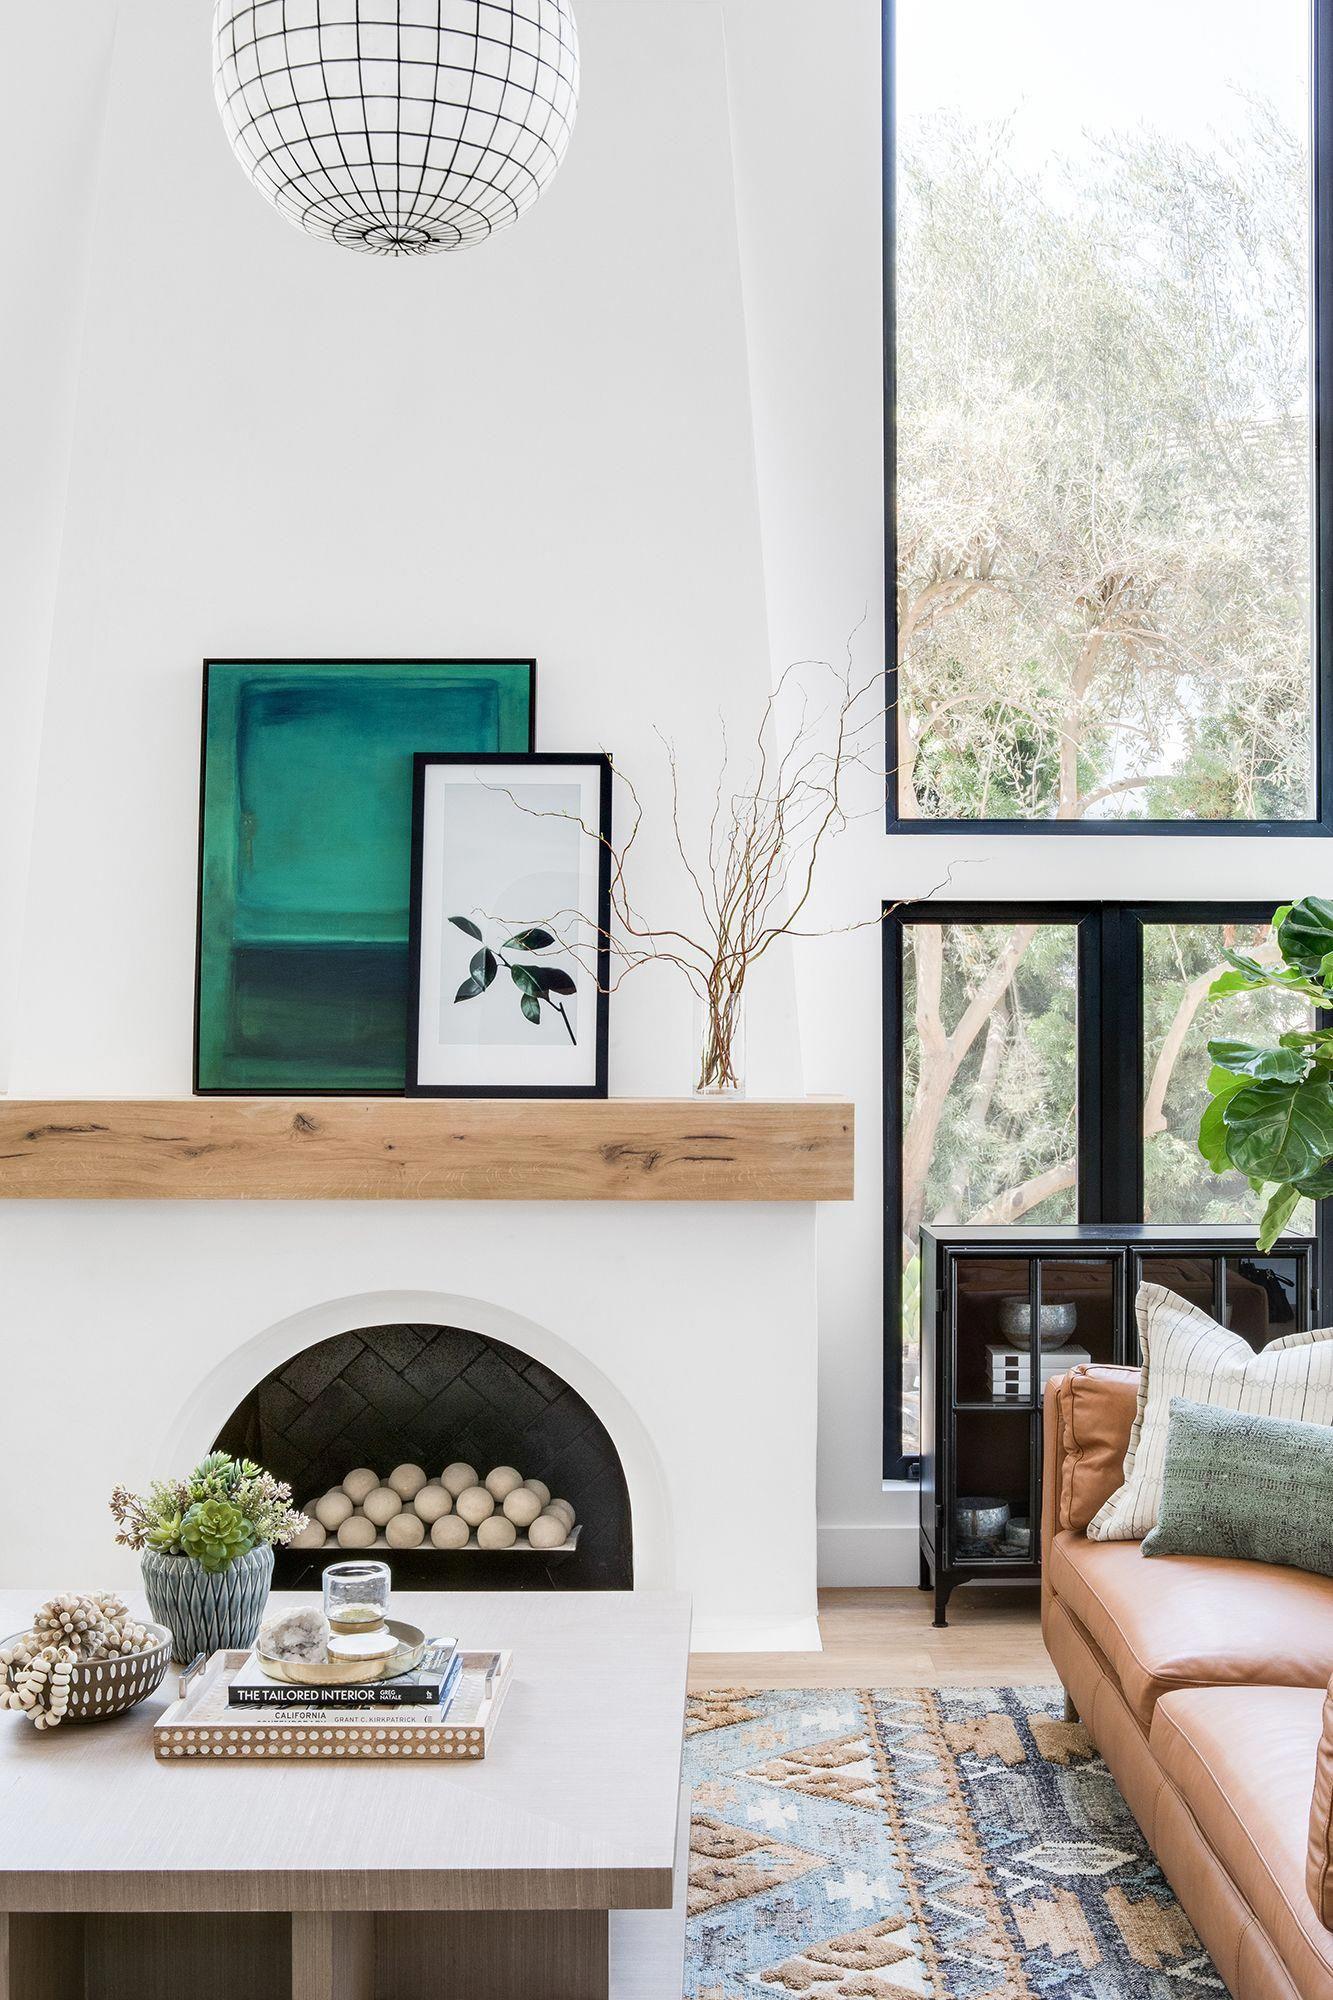 Spanish Modern Home Tour: Living Room Reveal - Lindye Galloway Interiors #moderndecor